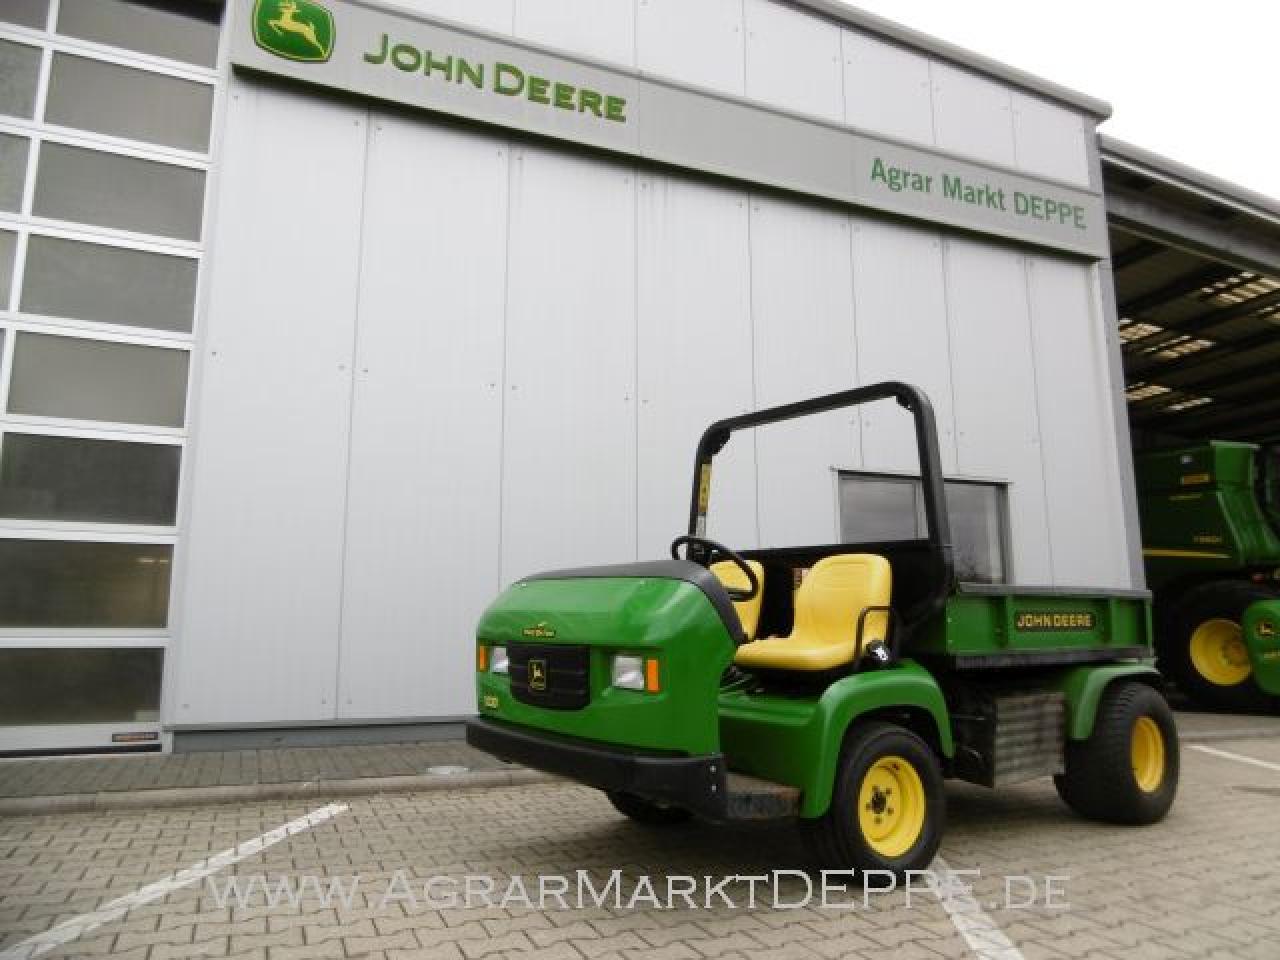 John Deere 2030 Pro-Gator